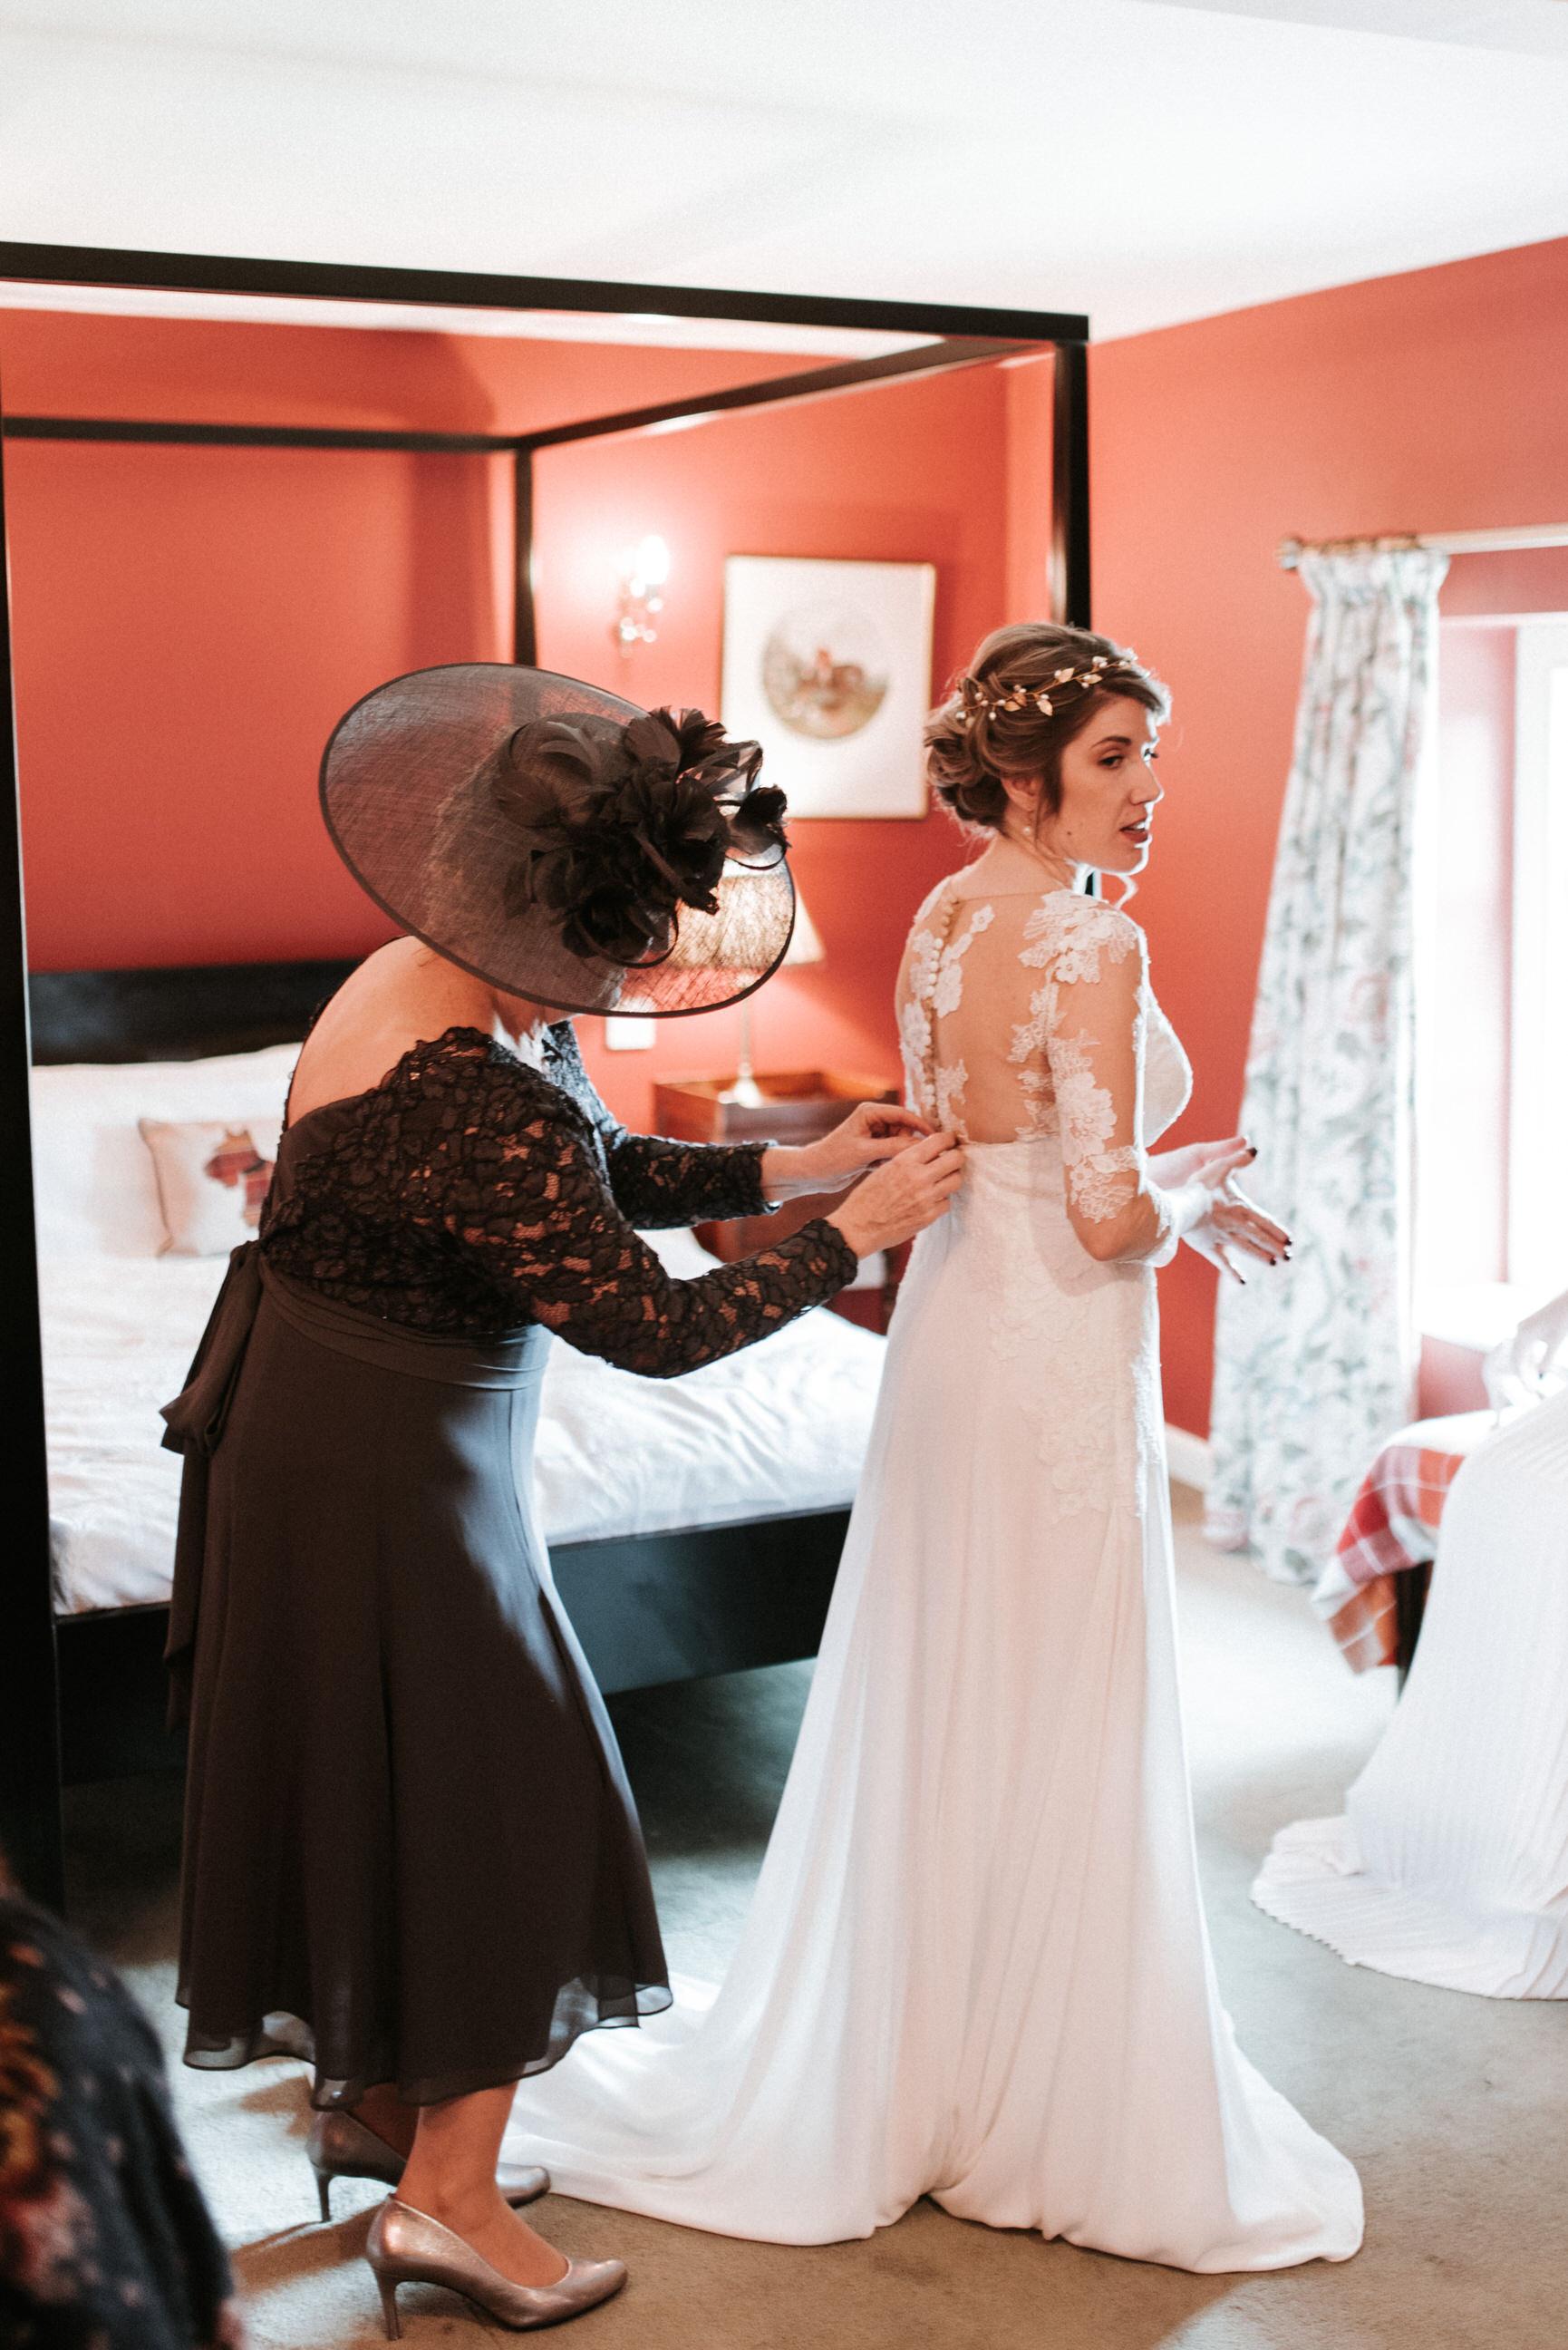 lissanoure castle wedding, northern ireland wedding photographer, romantic northern irish wedding venue, castle wedding ireland, natural wedding photography ni (34).jpg